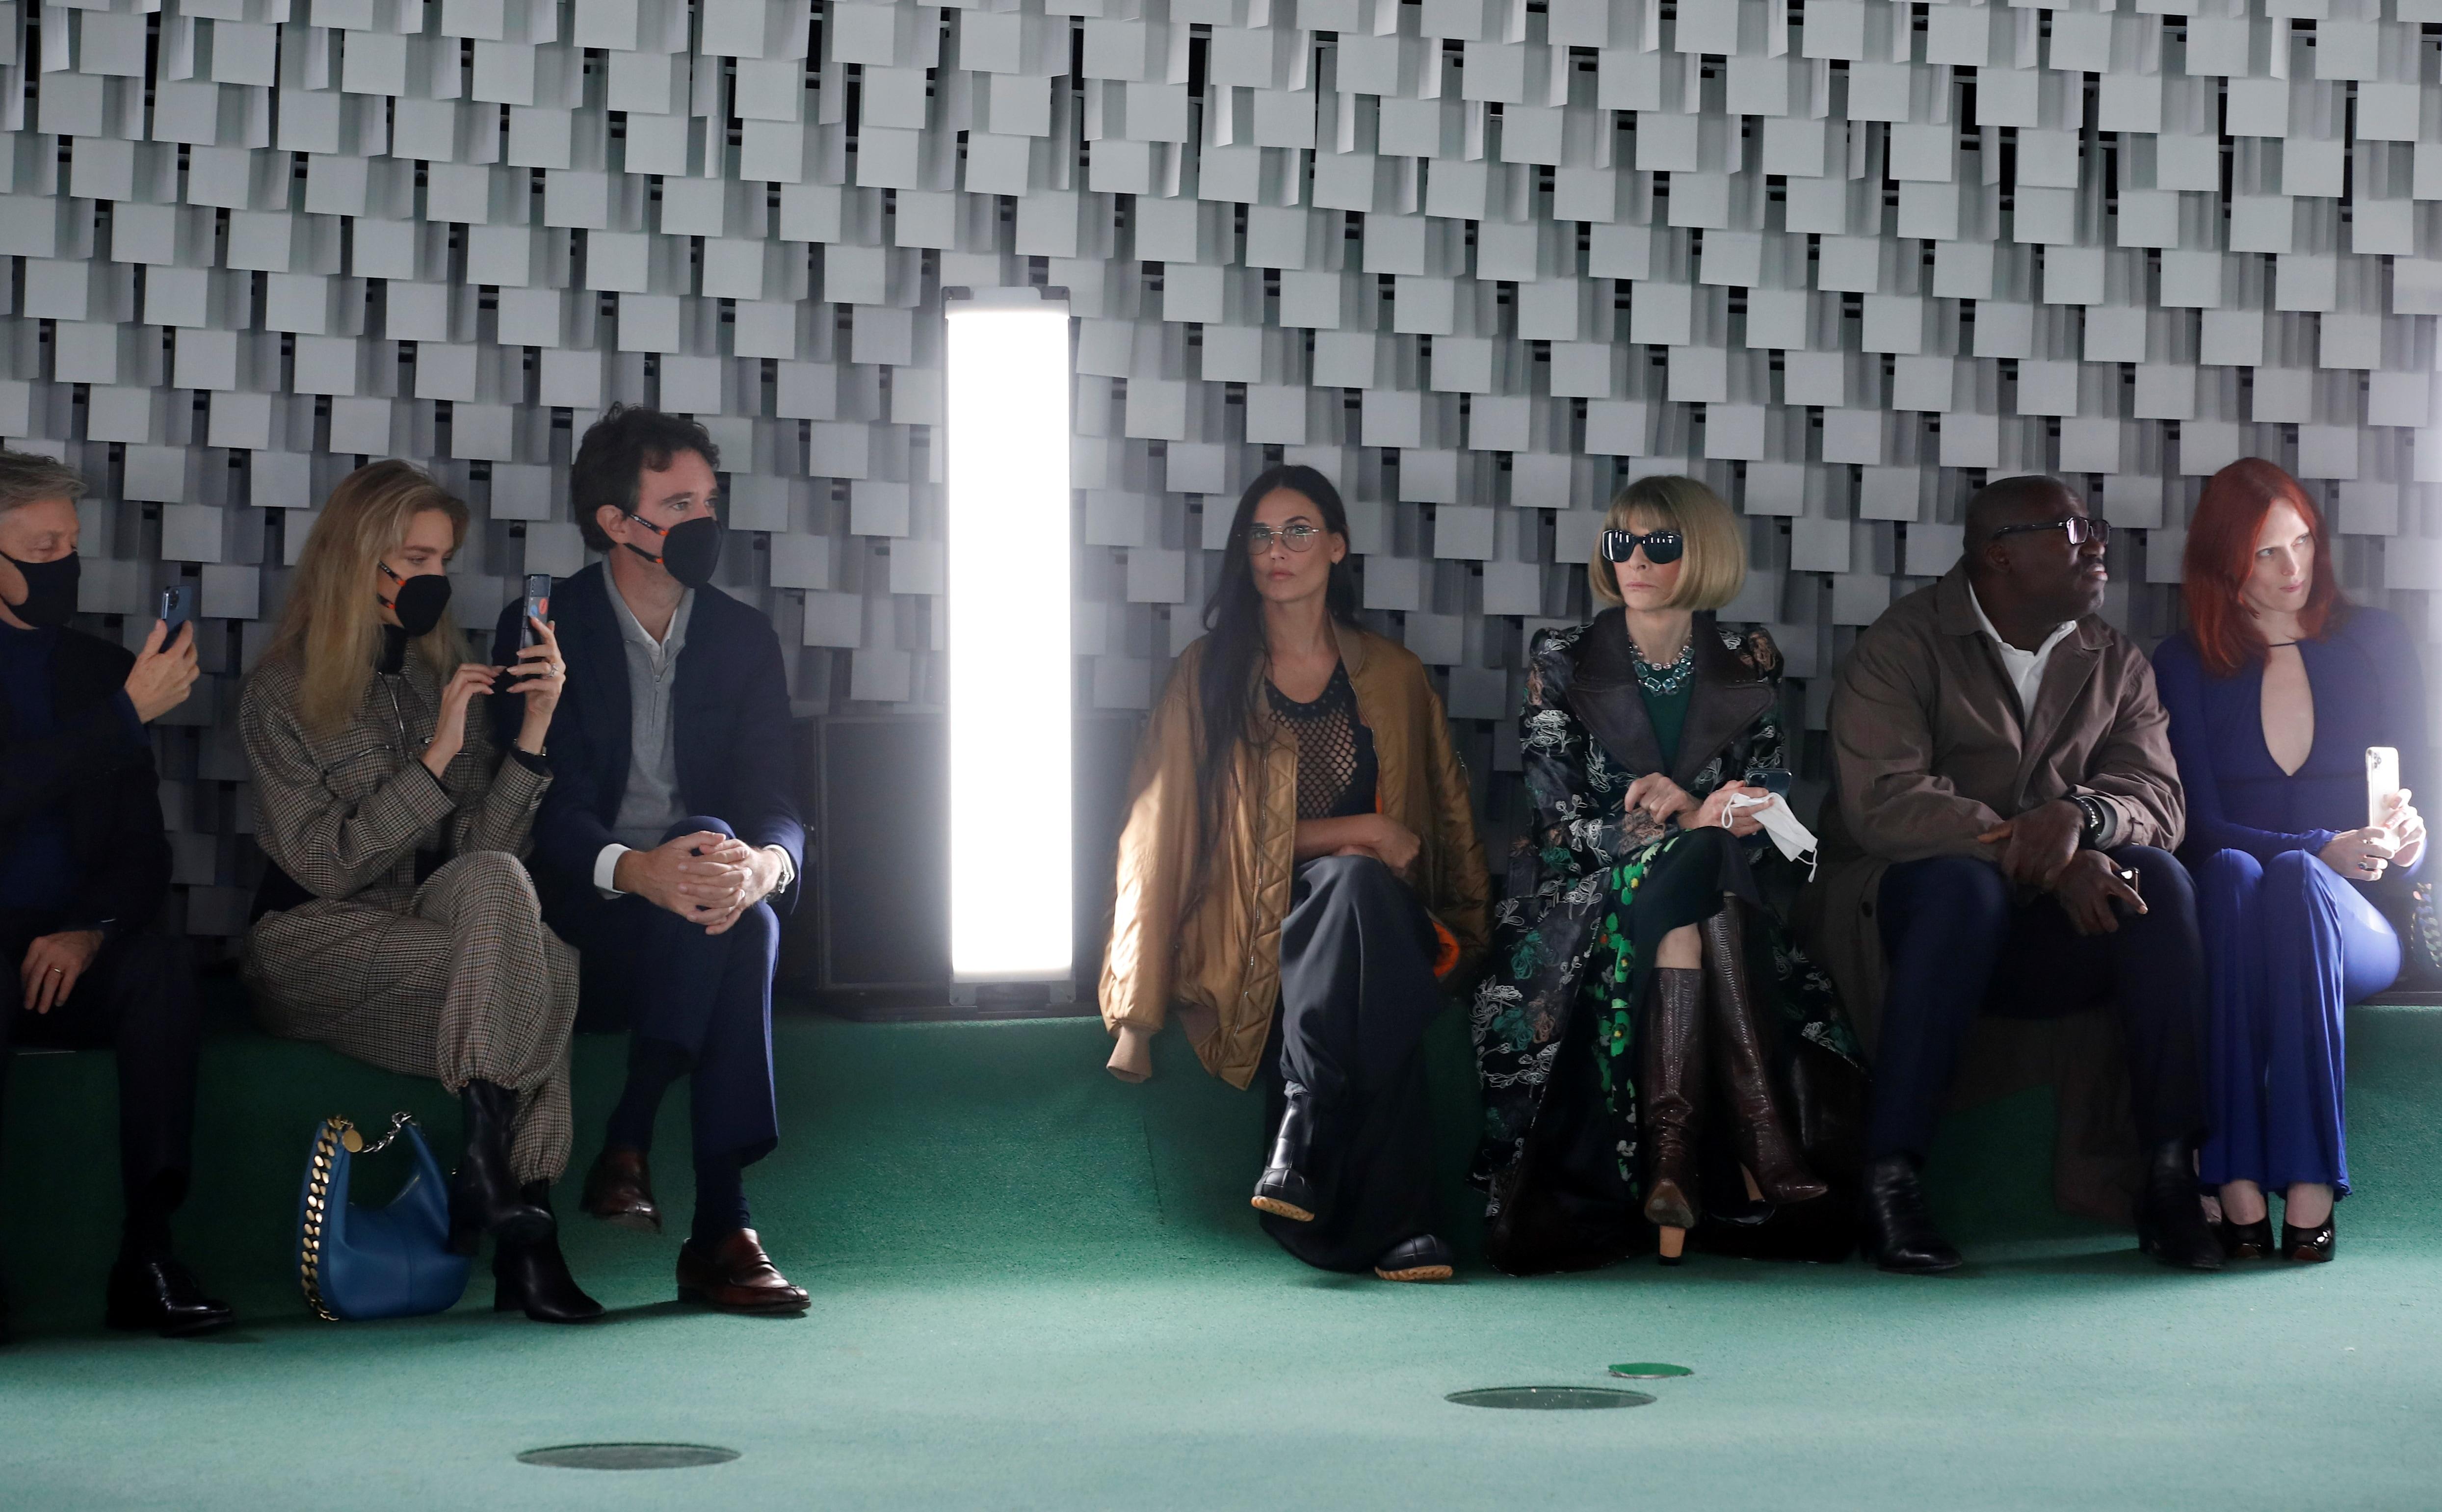 Sir Paul McCartney, Antoine Arnault and his wife Natalia Vodianova, Demi Moore, Edward Enninful and Karen Elson attend Stella McCartney show(REUTERS)